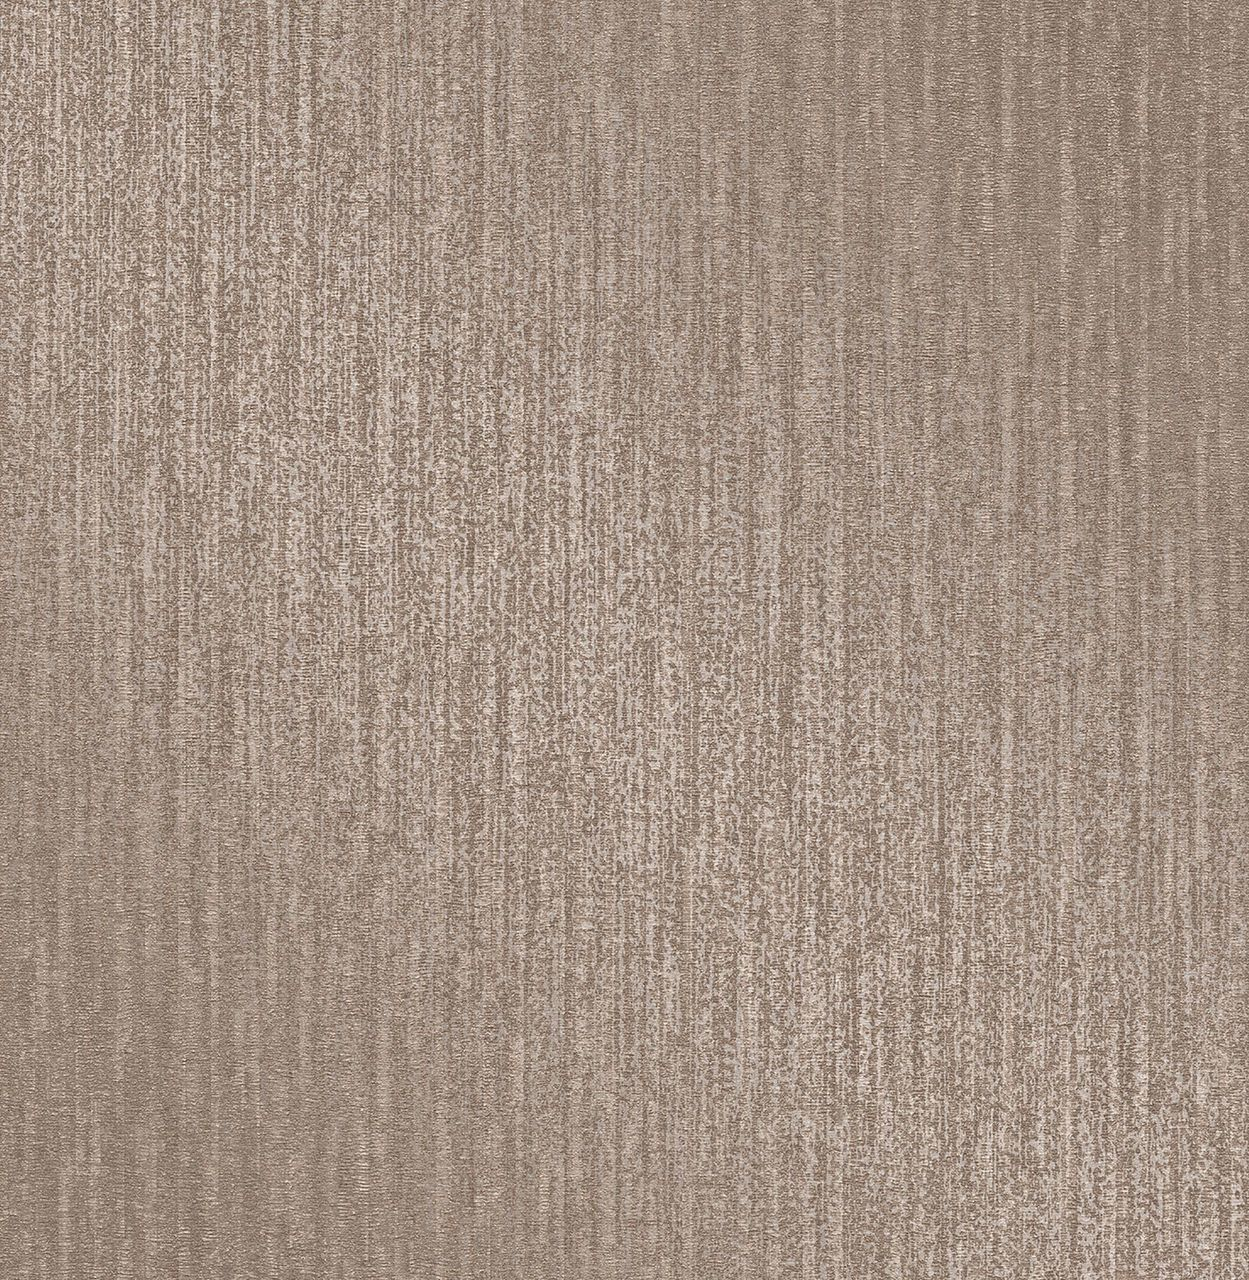 Decorline By Brewster 2735 23351 Joliet Light Brown Texture Wallpaper Textured Wallpaper Brown Texture Brown Wallpaper